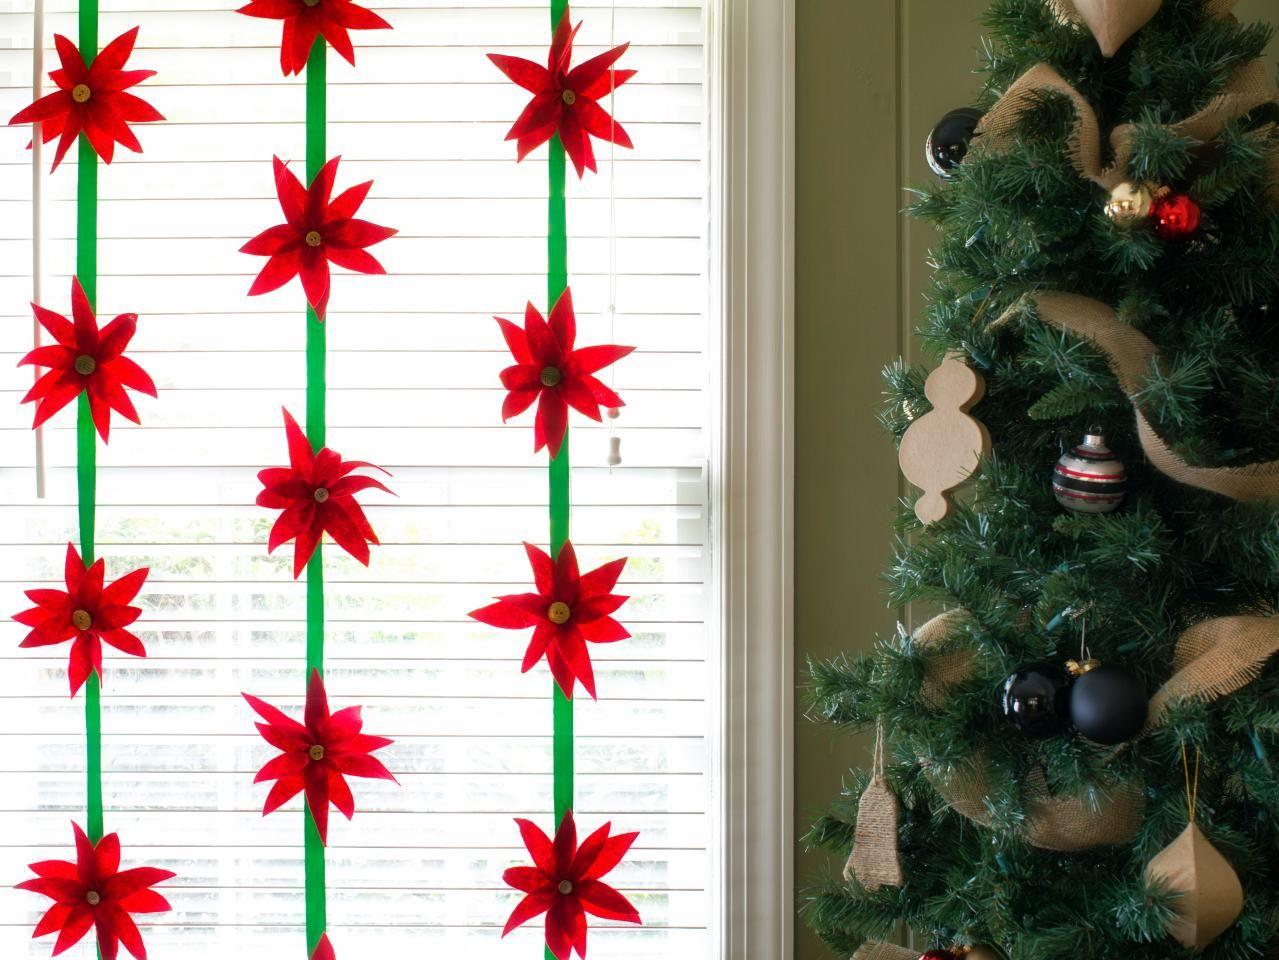 Christmas homemade decorations for kids - 50 Christmas Crafts For Kids Easy Crafts And Homemade Decorating Gift Ideas Hgtv